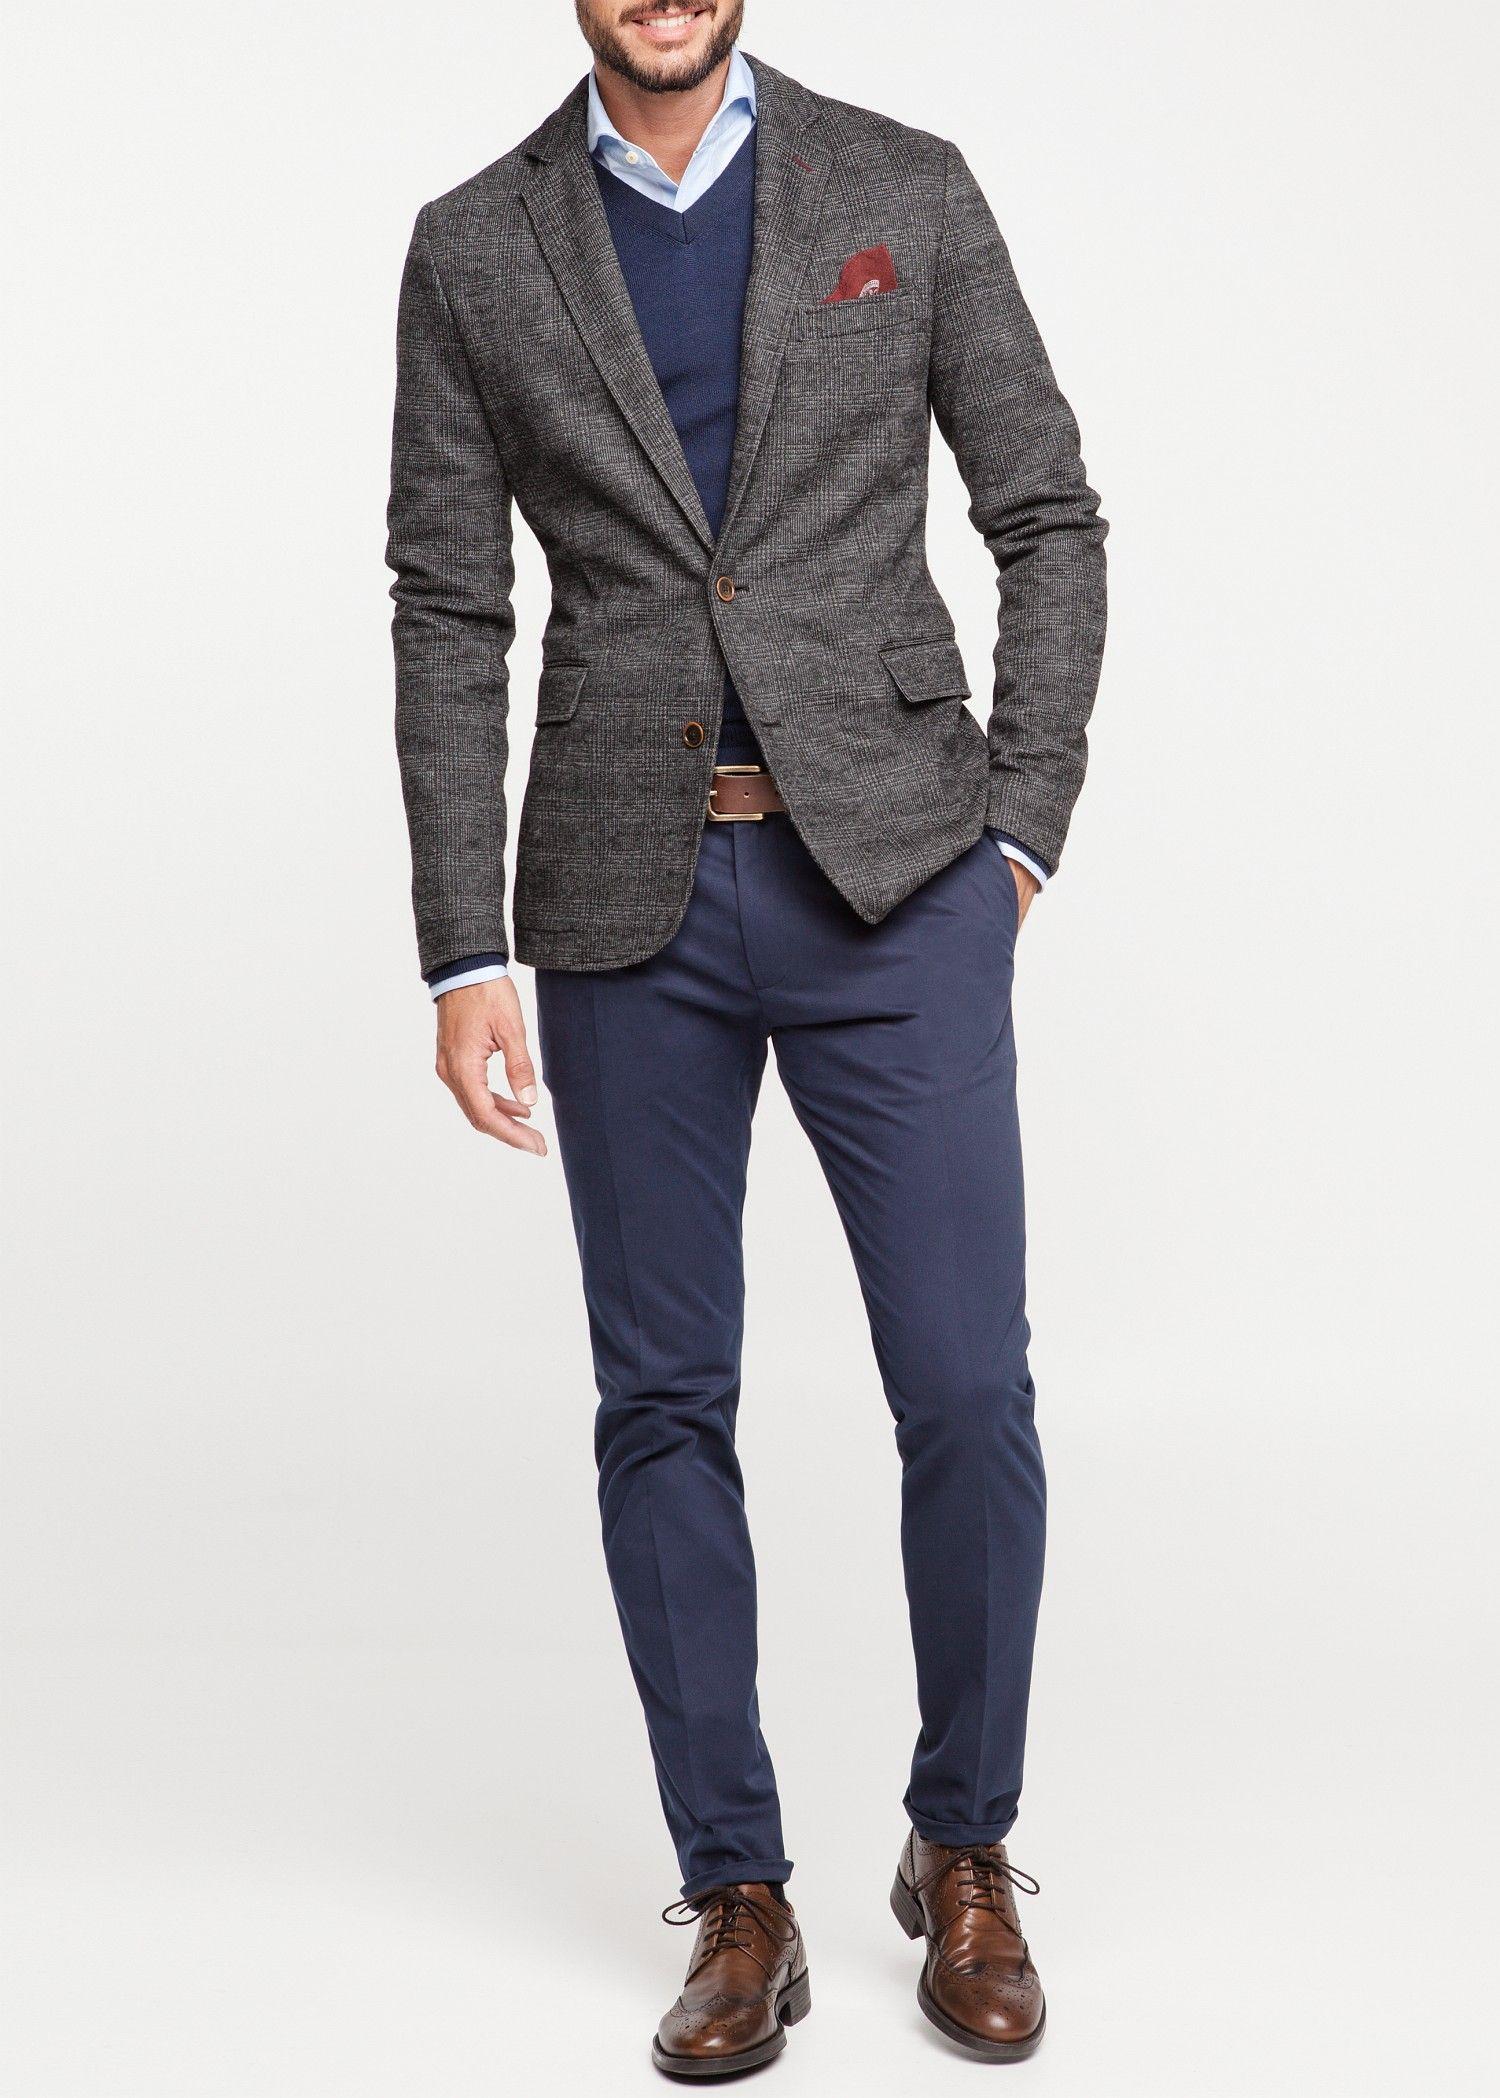 f9abf883790b0 H.E. by Mango PRINCE OF WALES Blazer.  menswear  style  dapper ...